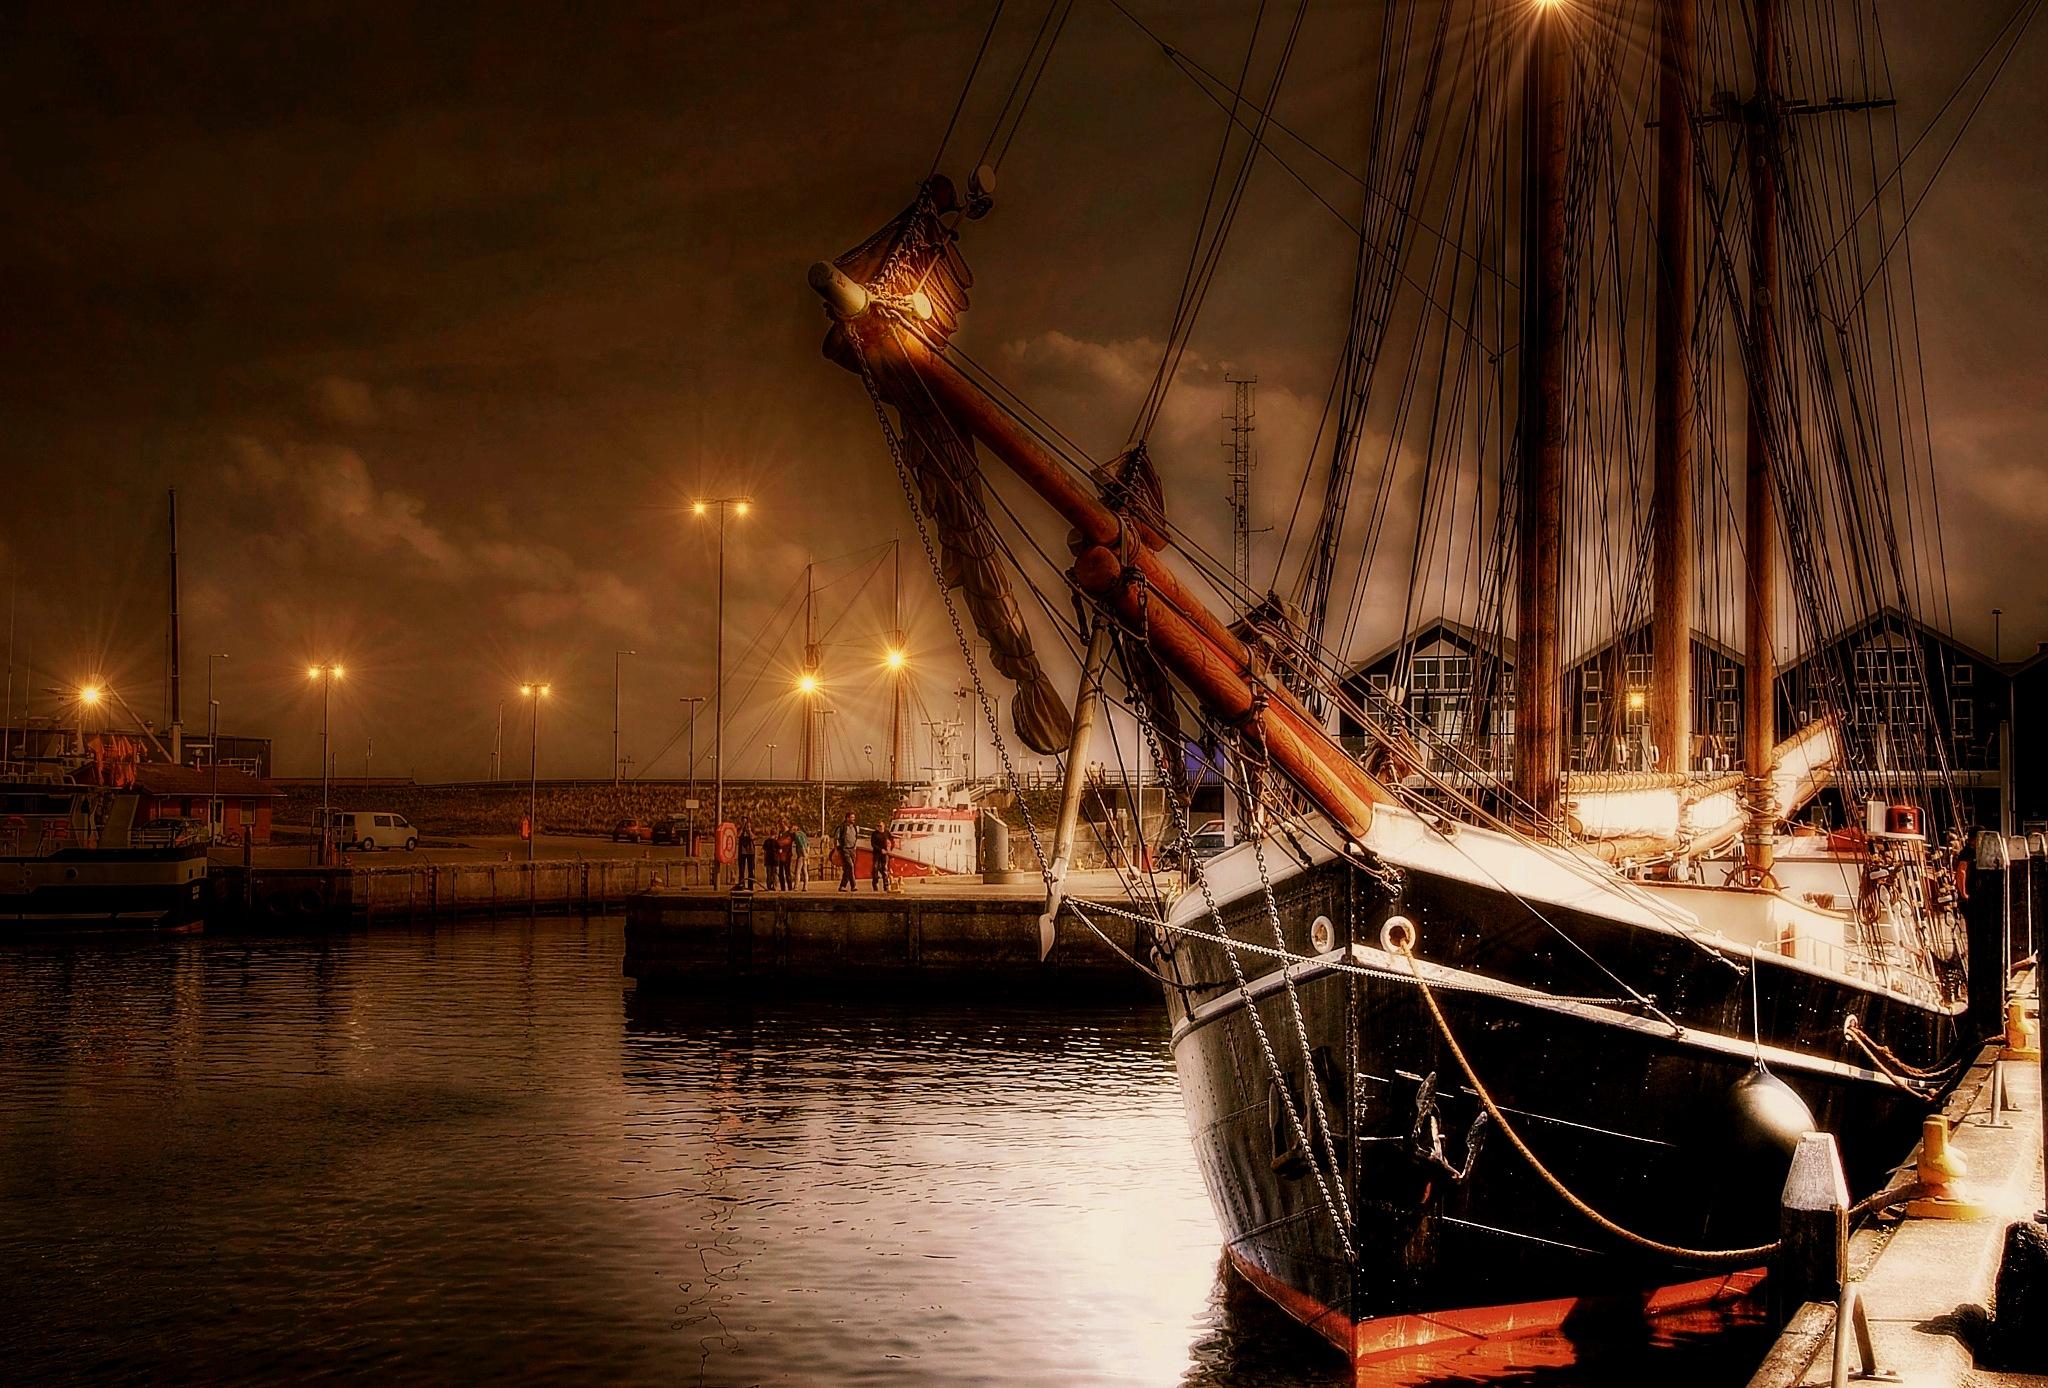 lamplight by kordi